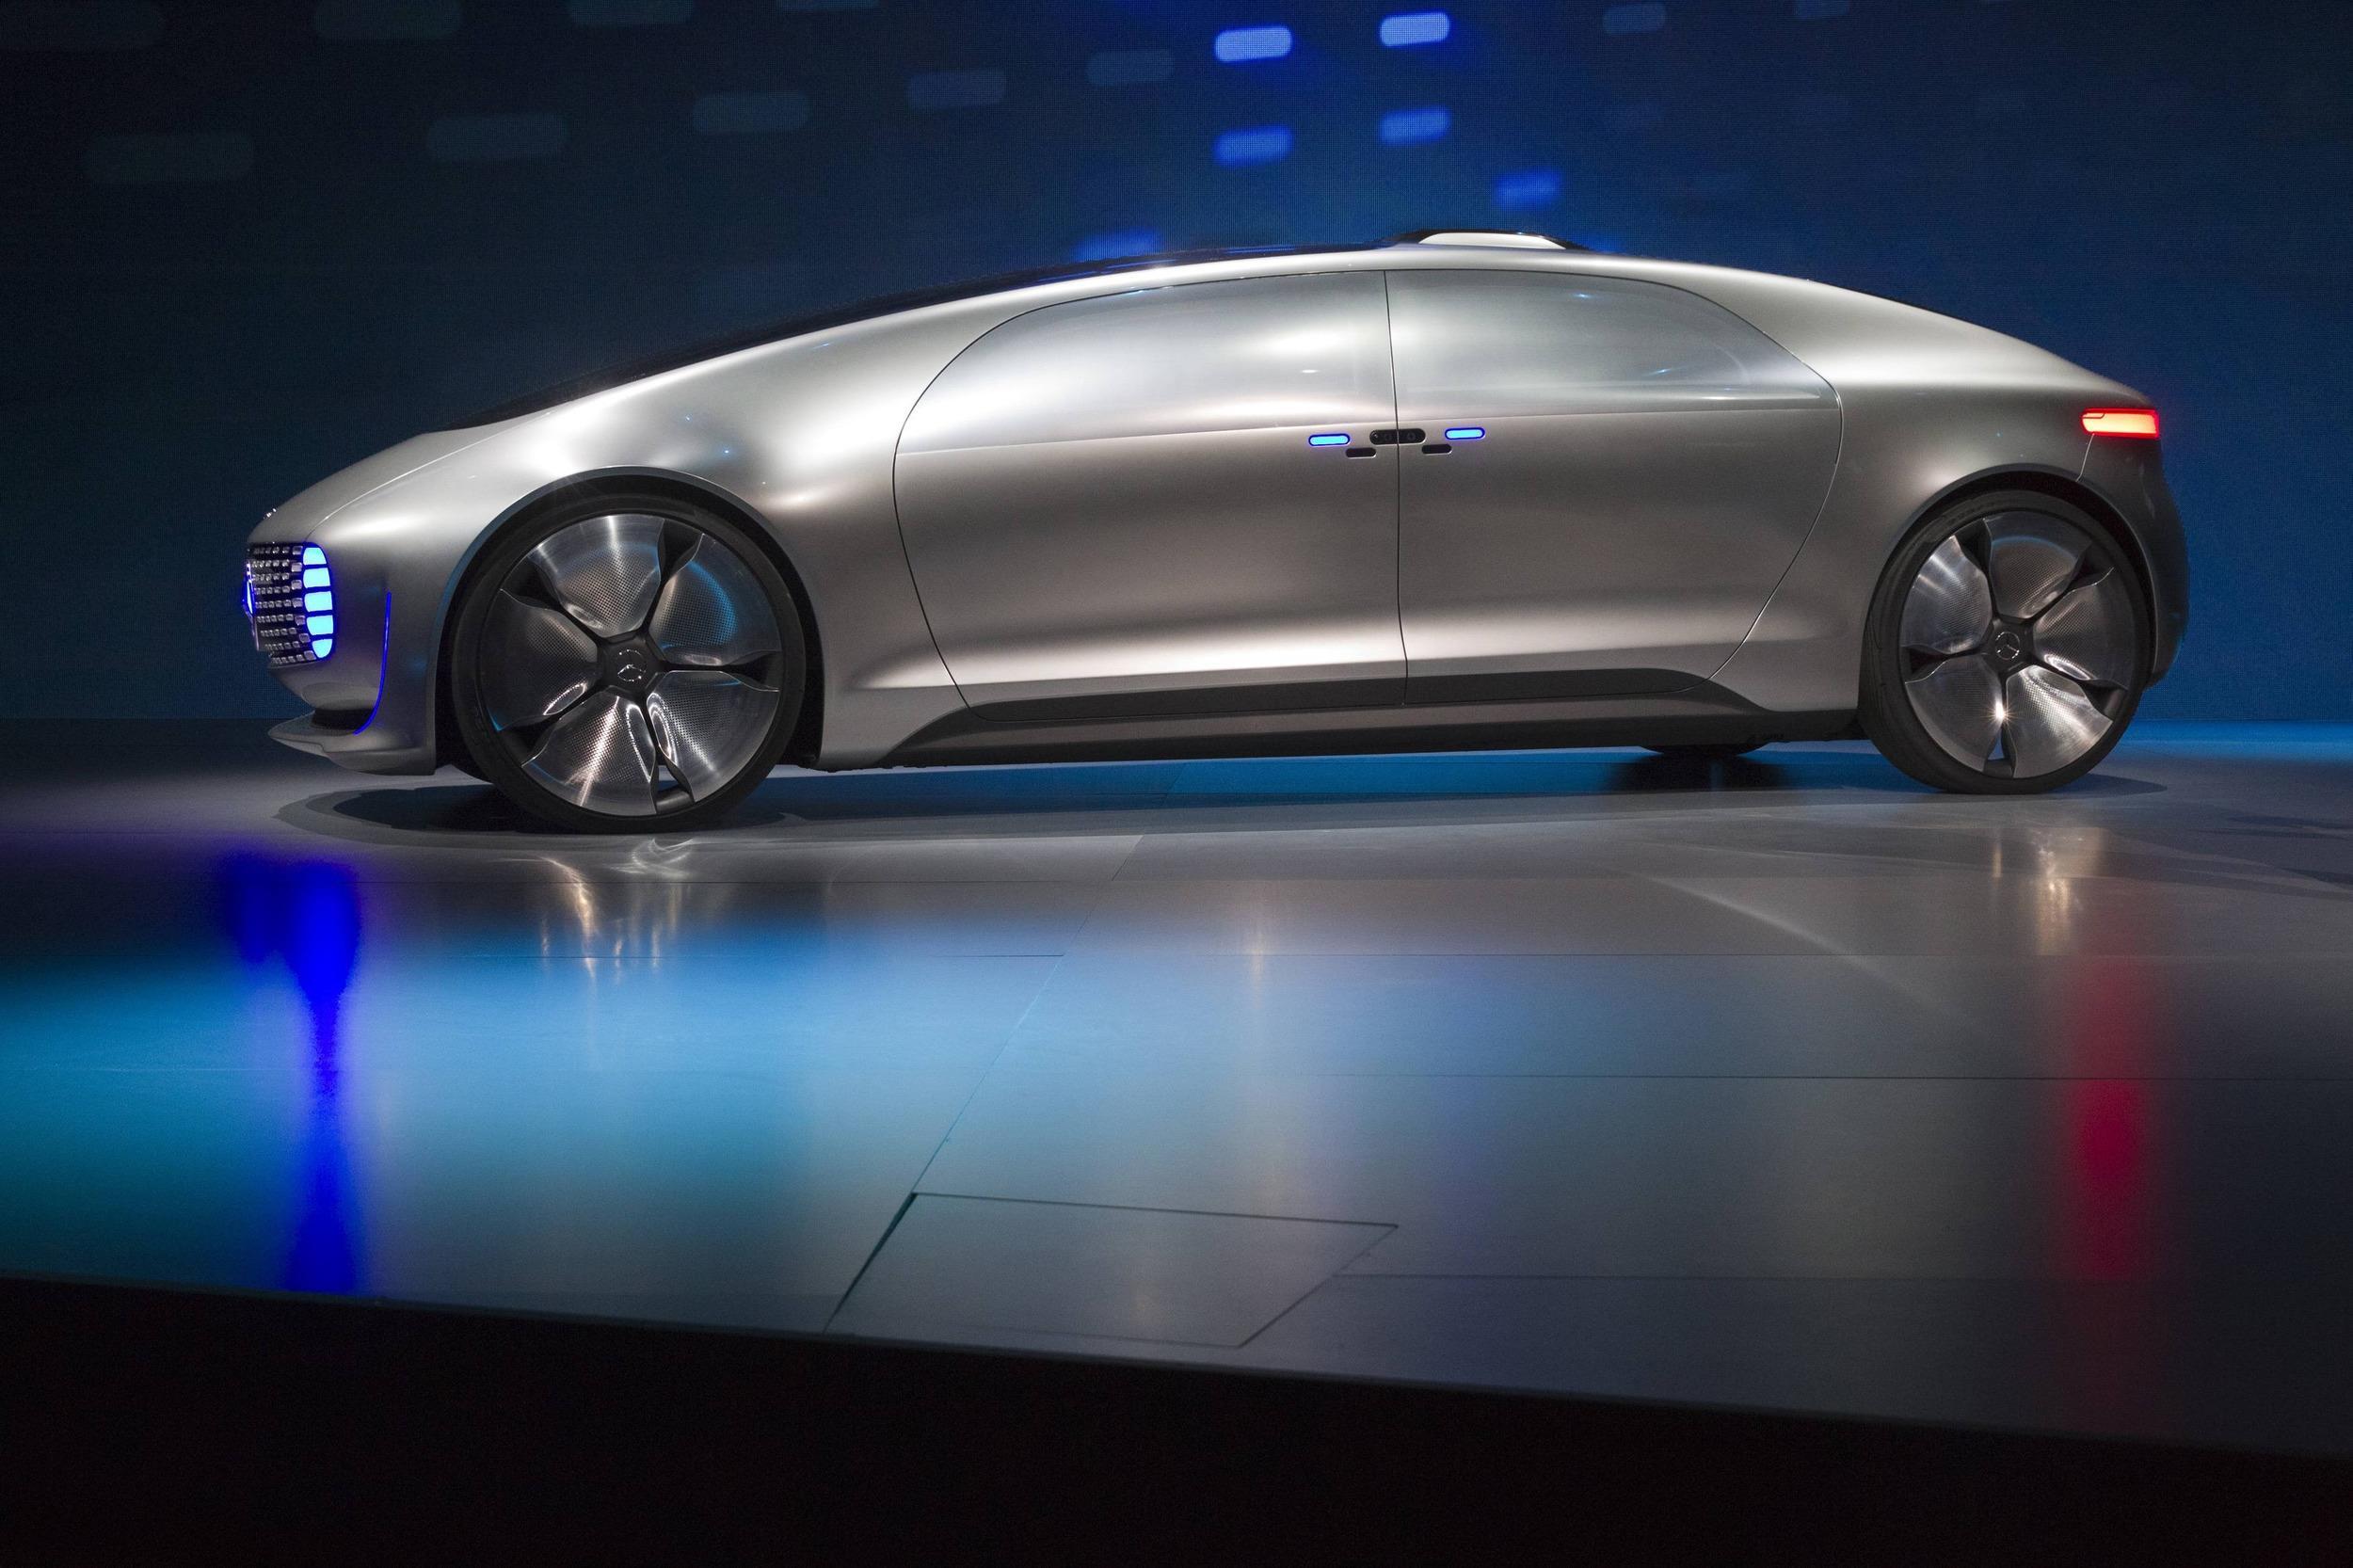 Mercedes Futuristic View Autonomy Meets Connectivity